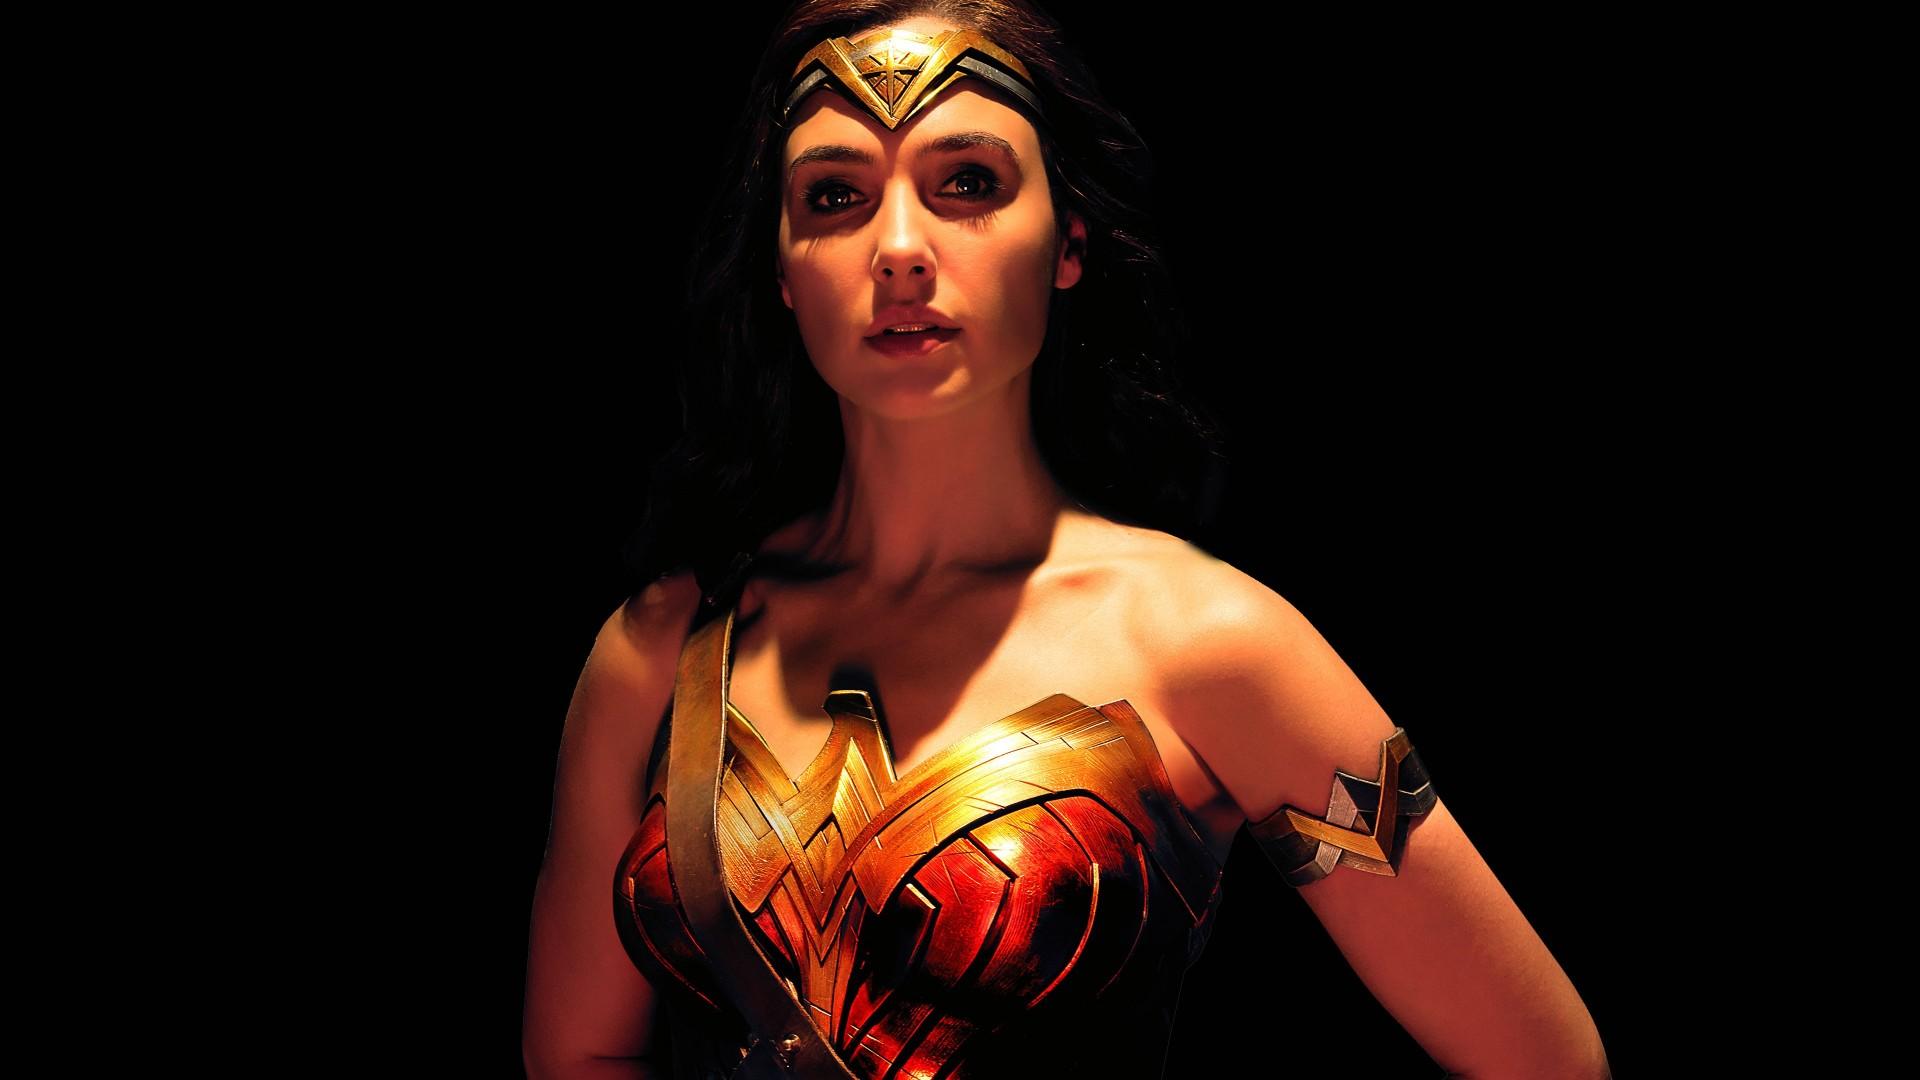 Wallpaper Justice League Wonder Woman Gal Gadot 4k Movies 15488